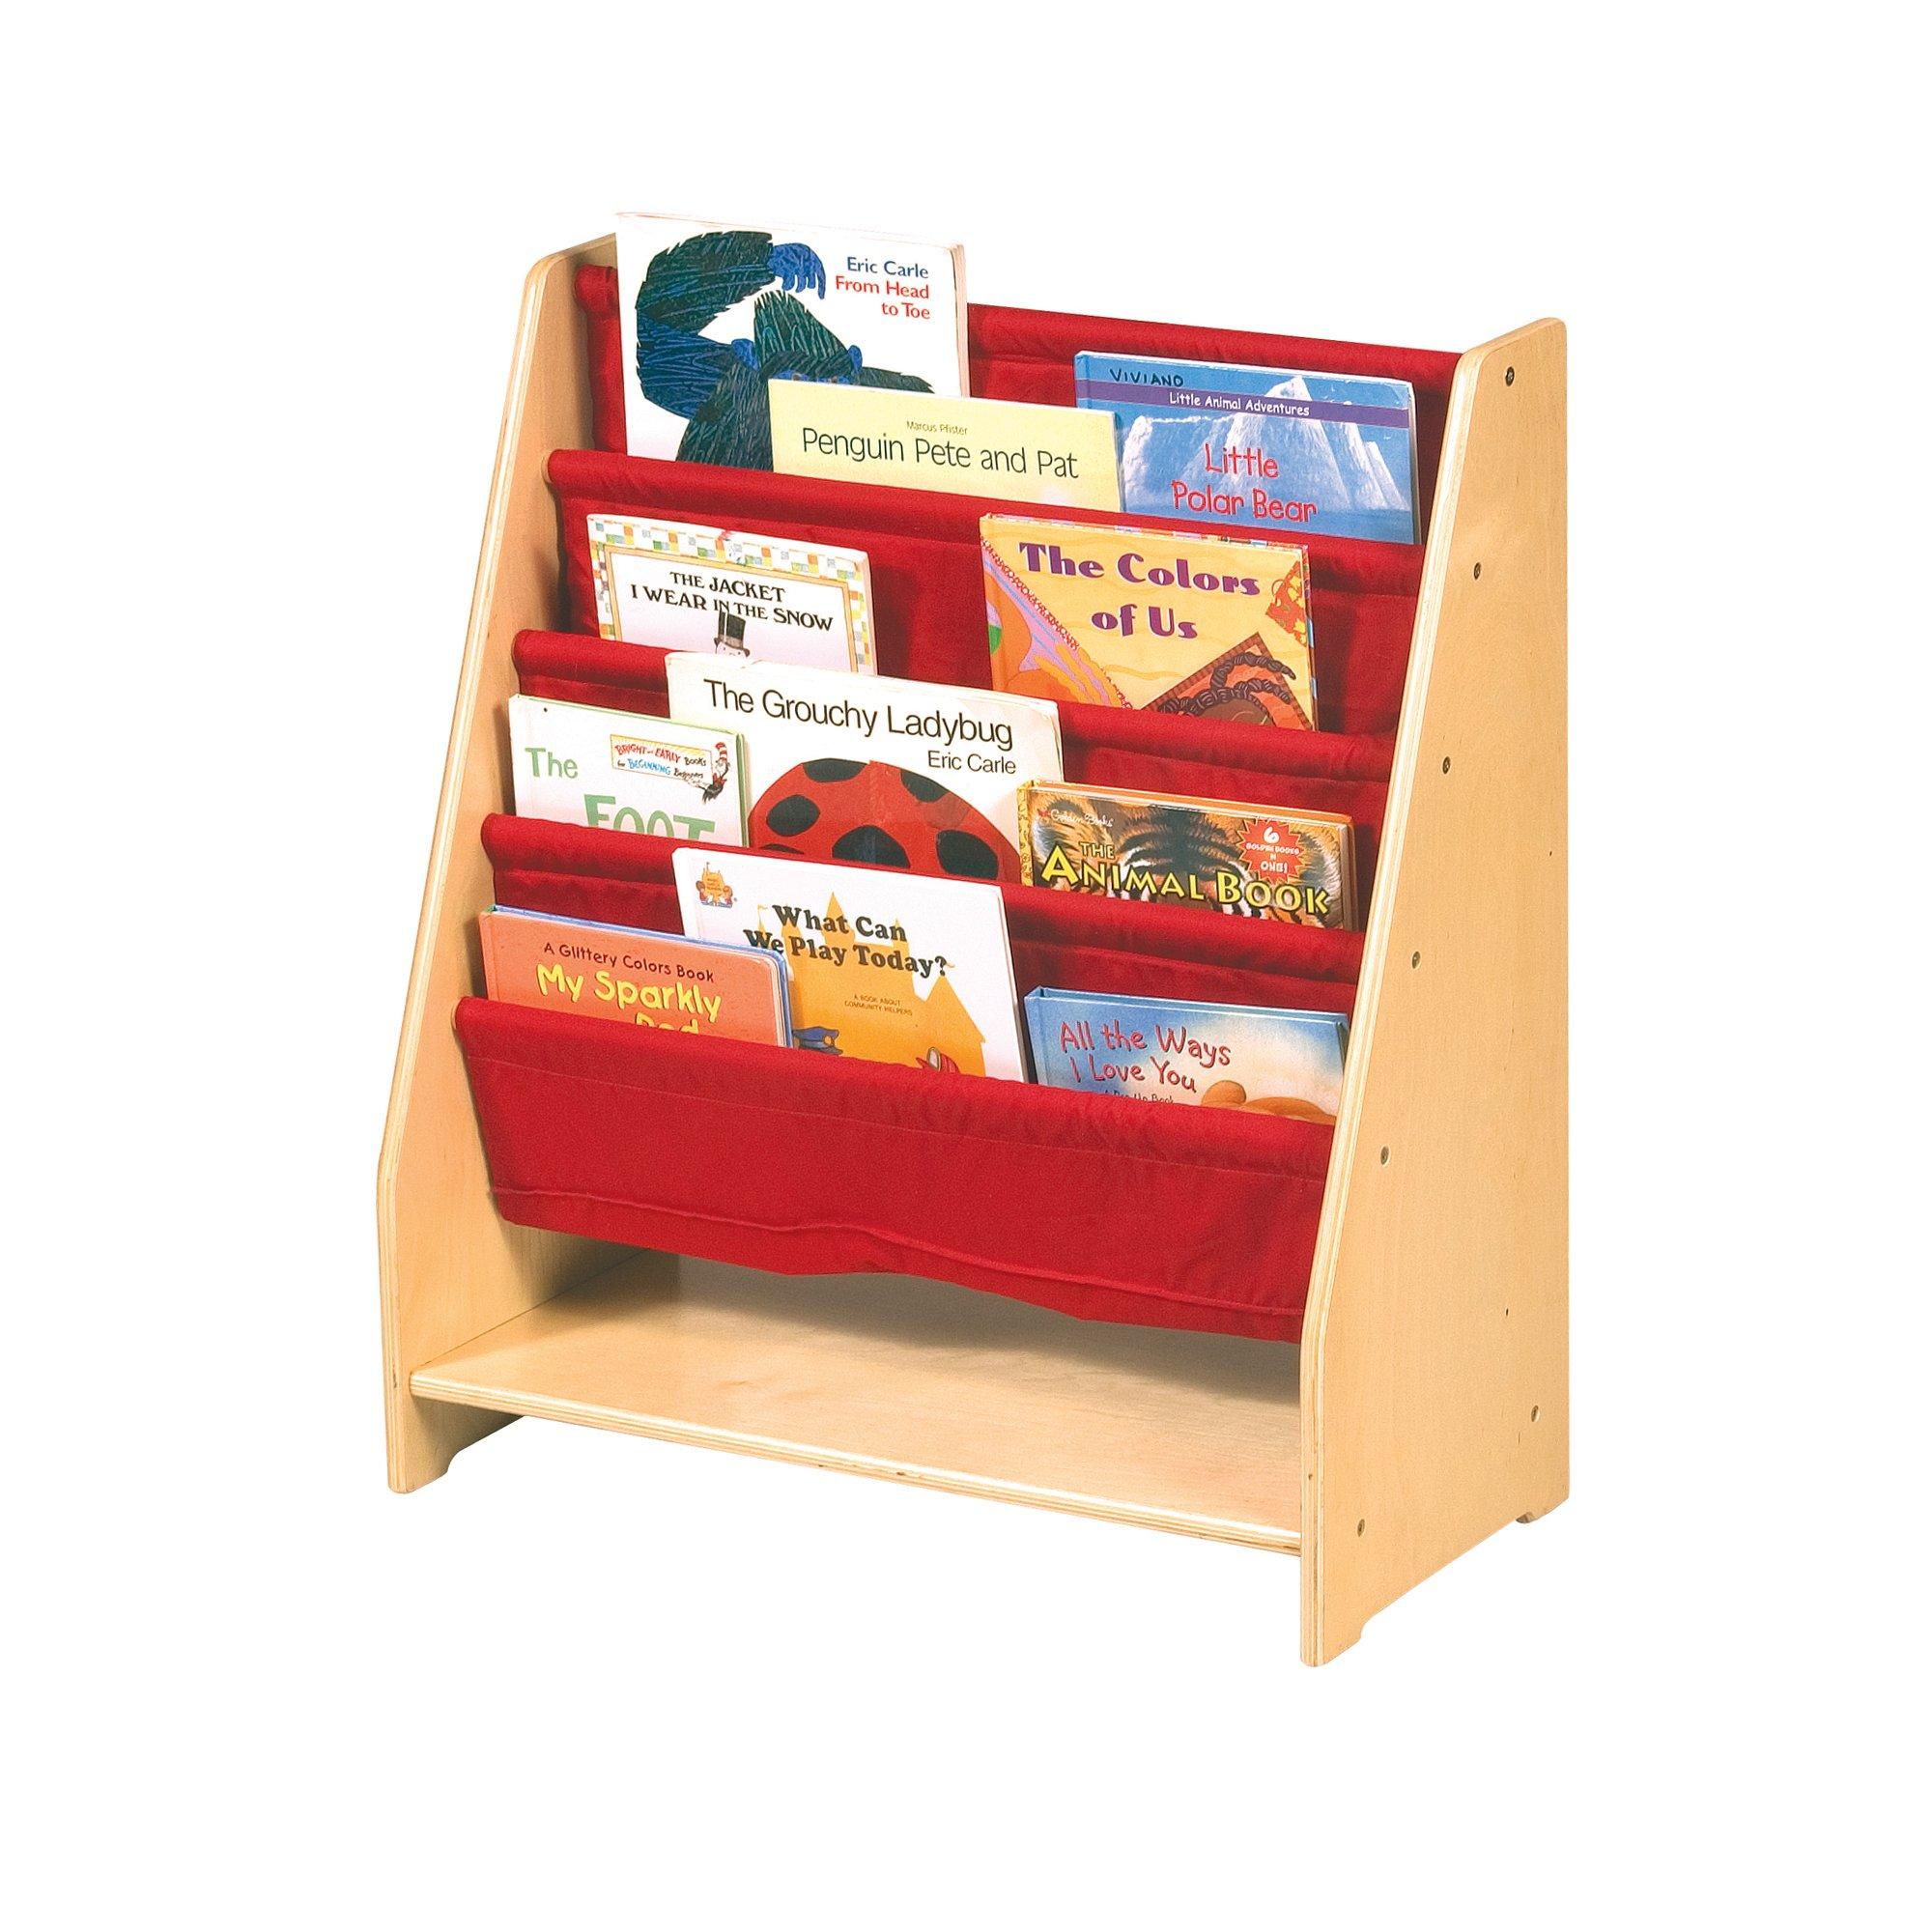 Guidecraft Canvas Sling Bookshelf - Book Display Rack, Storage - Kids Furniture by Guidecraft